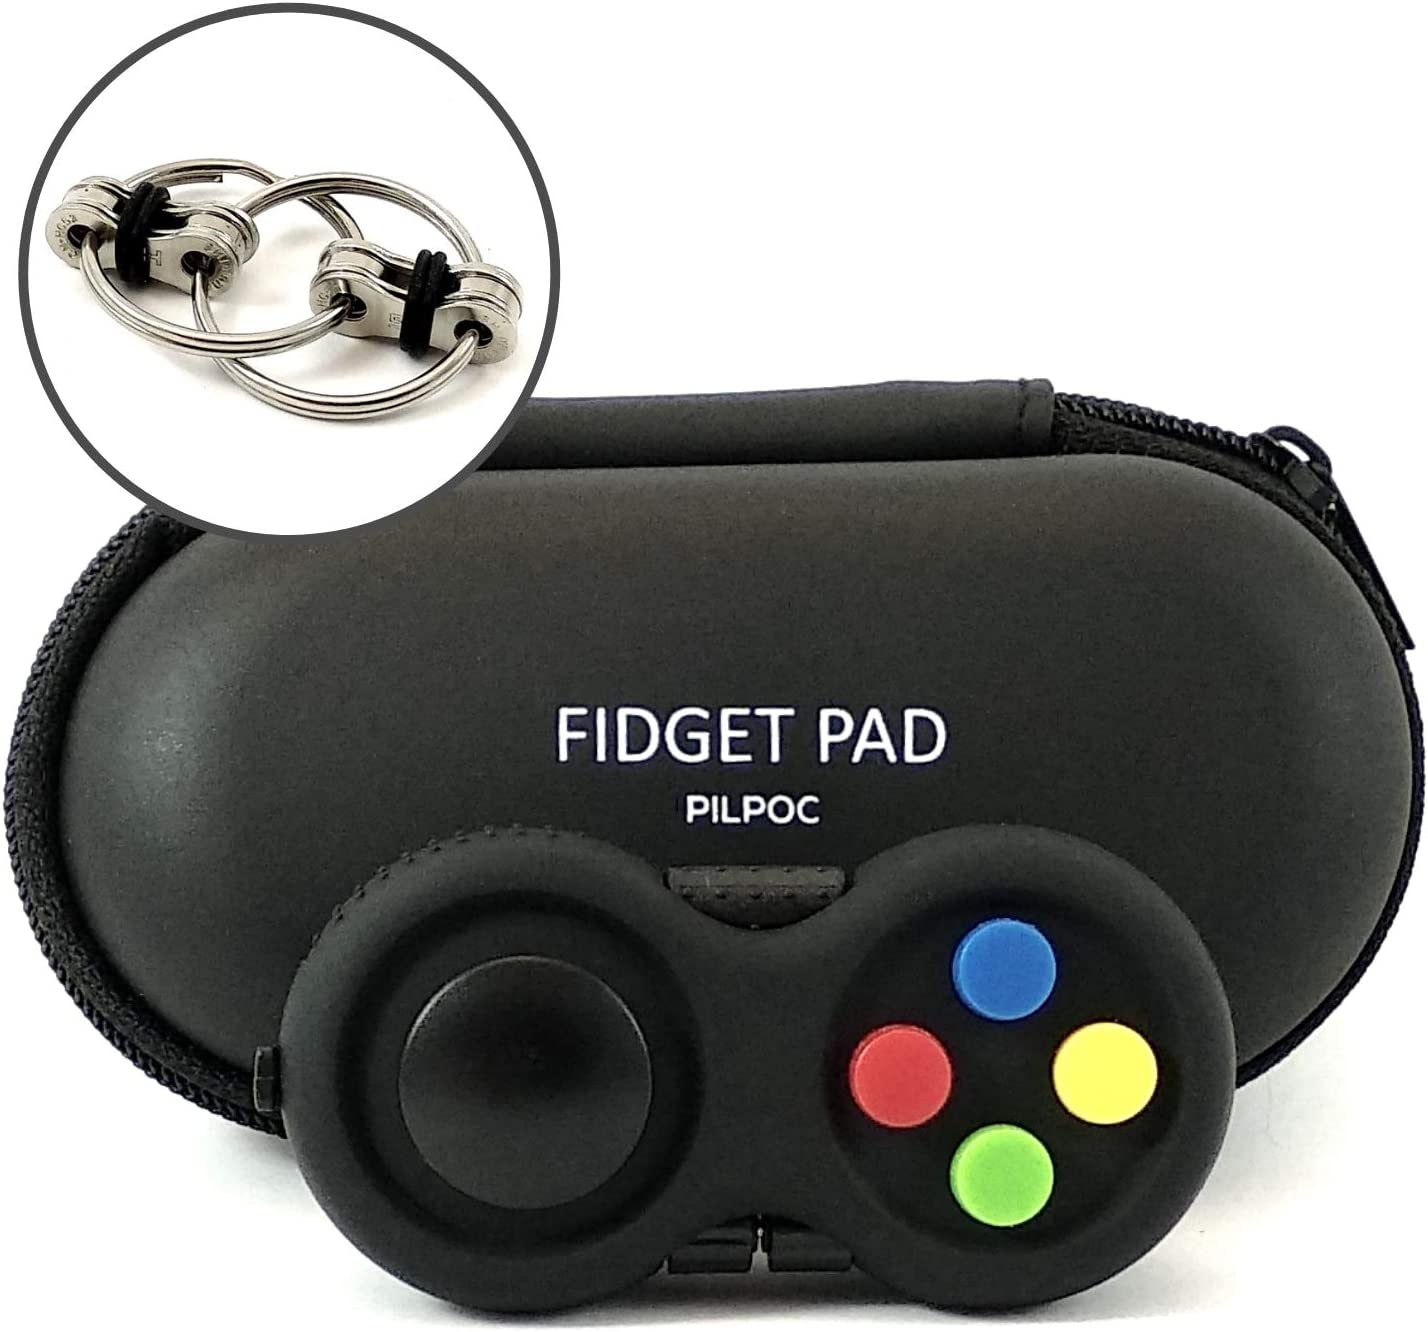 Pilpoc-Fidget-Controller-Pad-Cube /